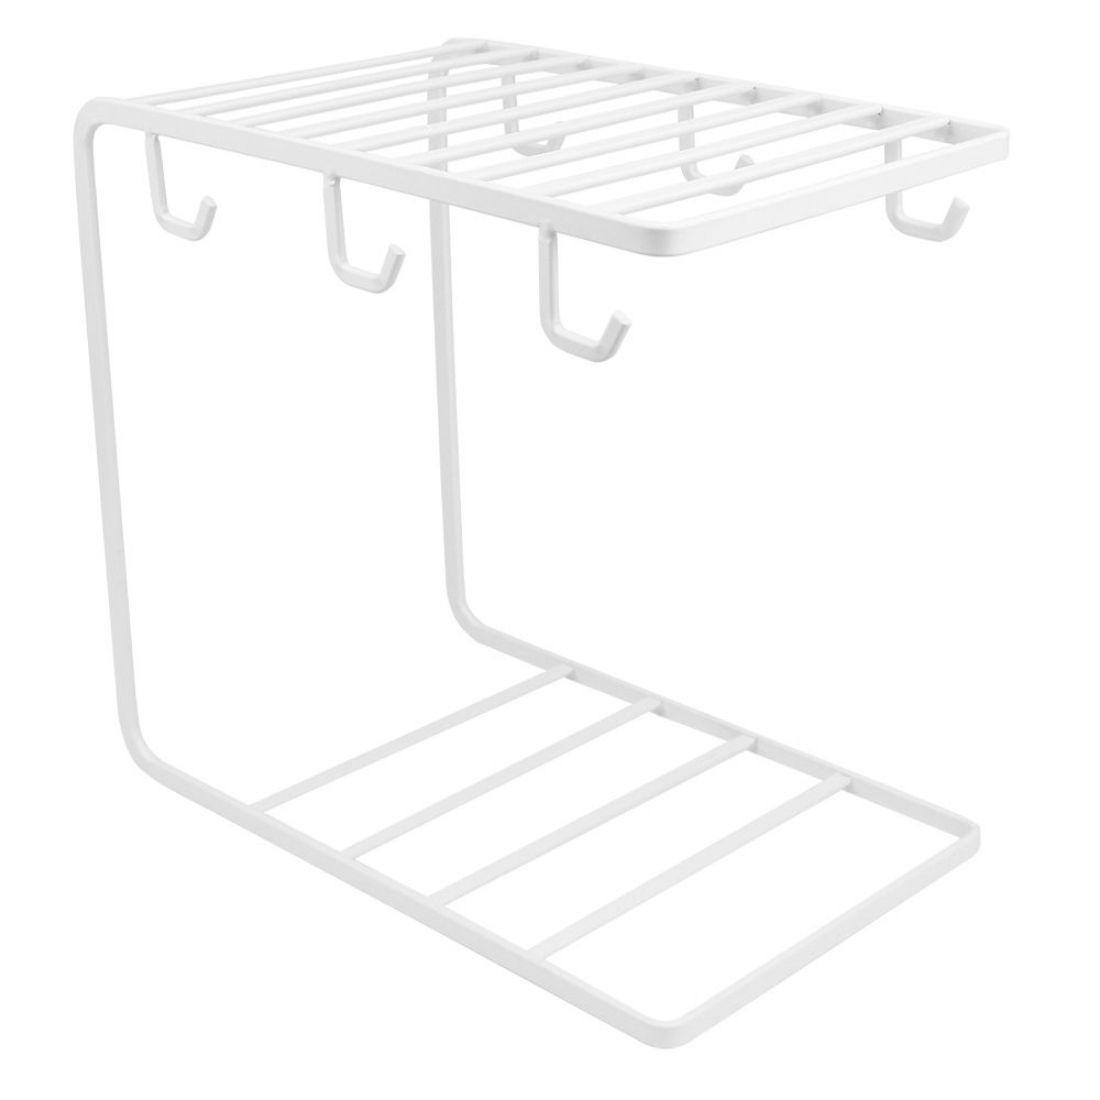 Porta Xícaras Pires Caneca Suporte Organizador Moderno Metal 6 unidades - Branco